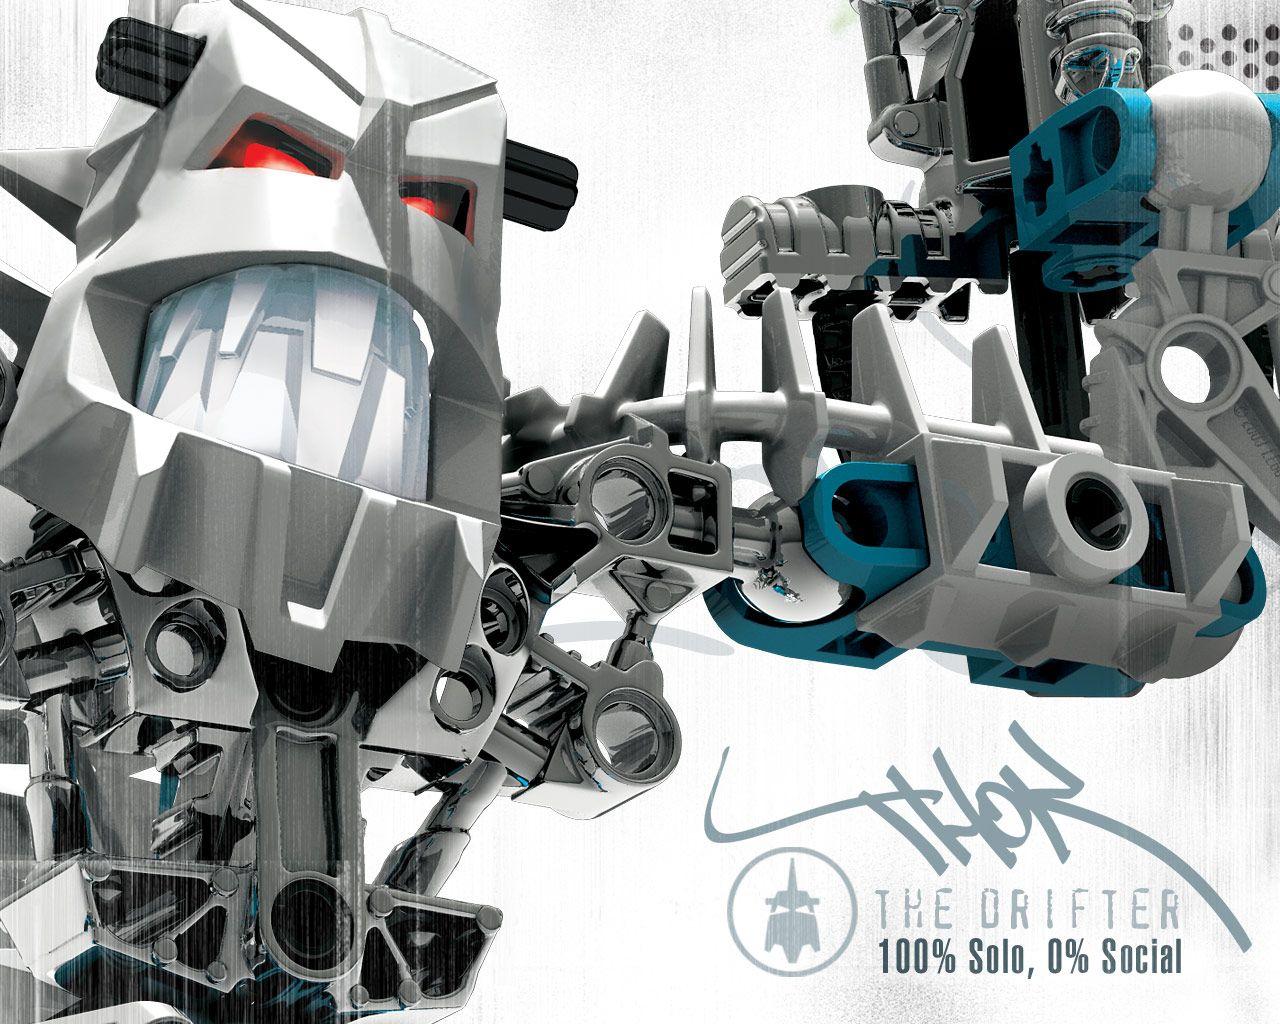 lego bionicle 2006 piraka - Google Search | Lego bionicle | Pinterest